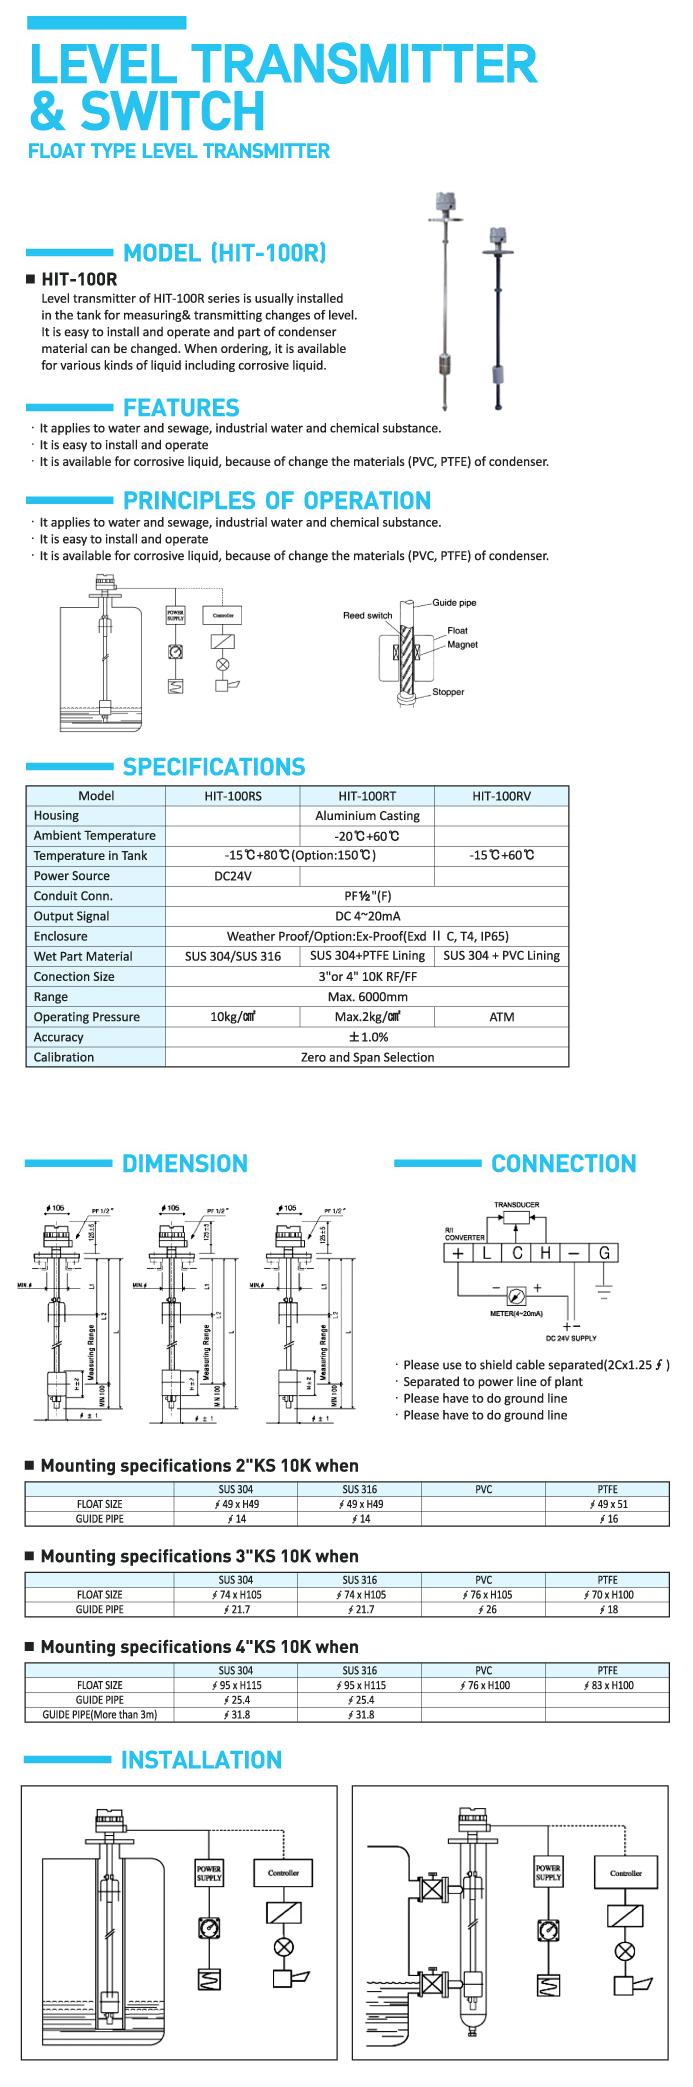 HITELFI Level Transmitter & Switch HIT-100R